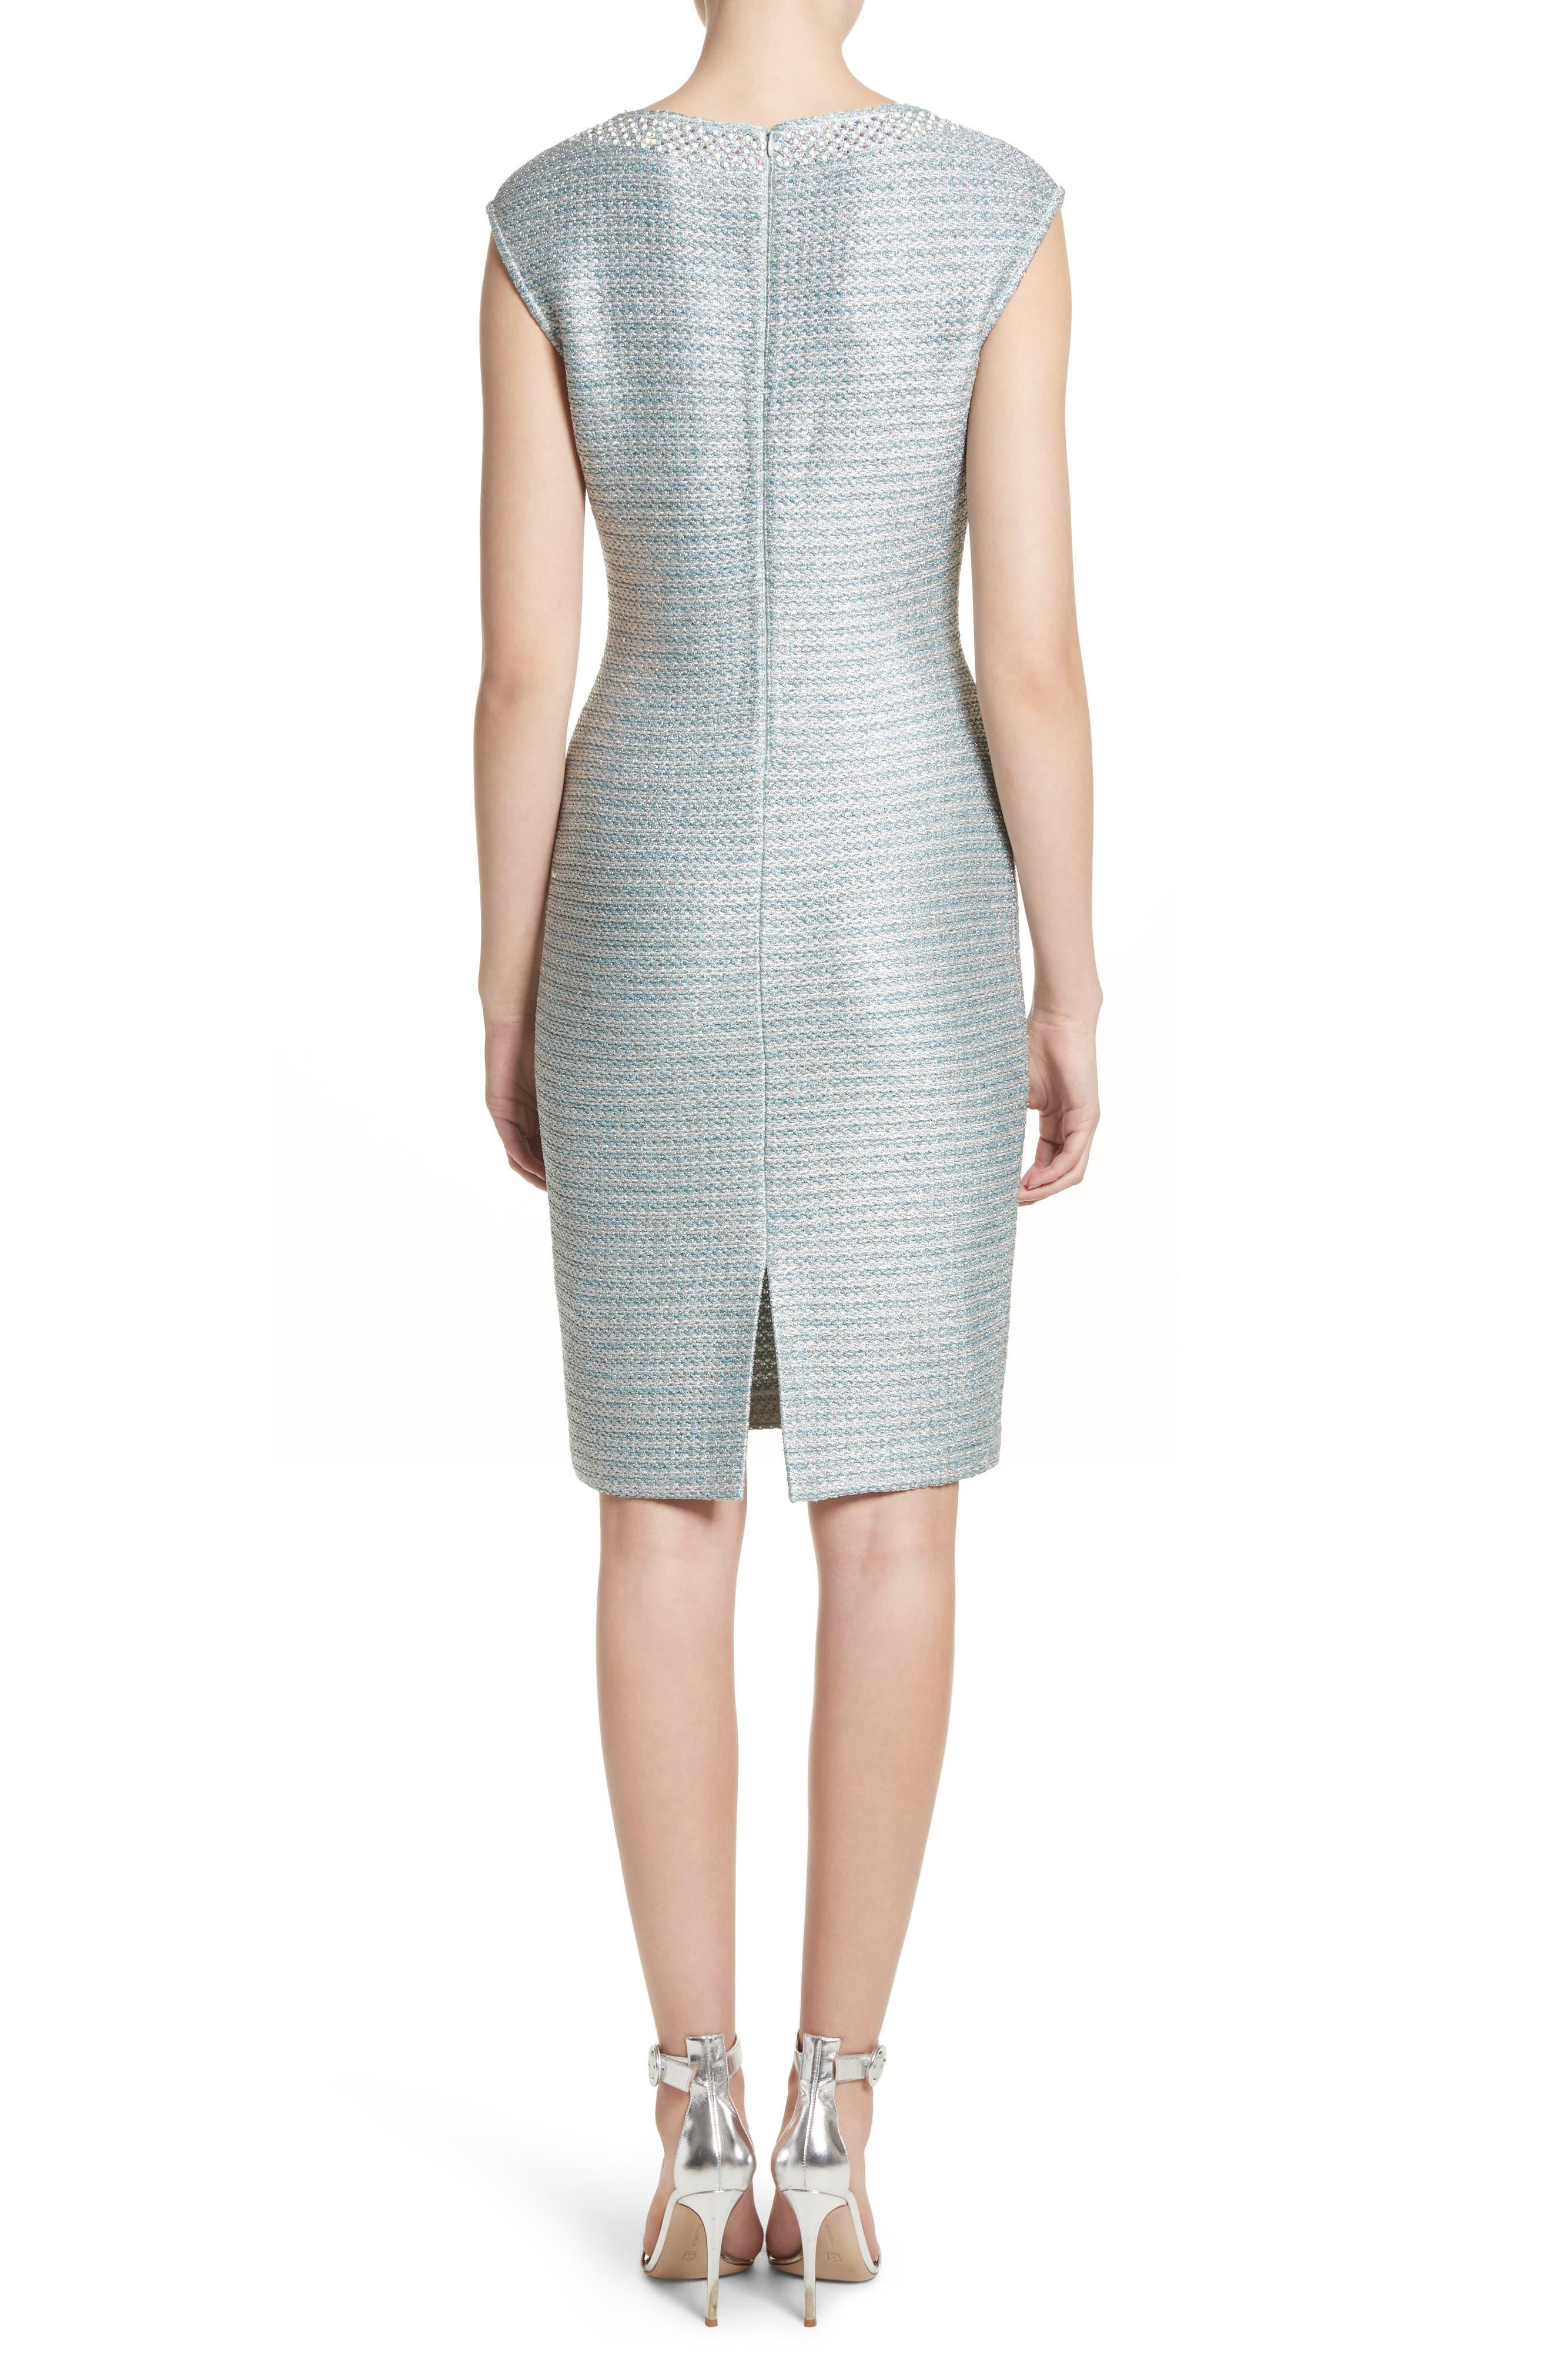 Gleam Metallic Knit Sheath Dress,                             Alternate thumbnail 2, color,                             350